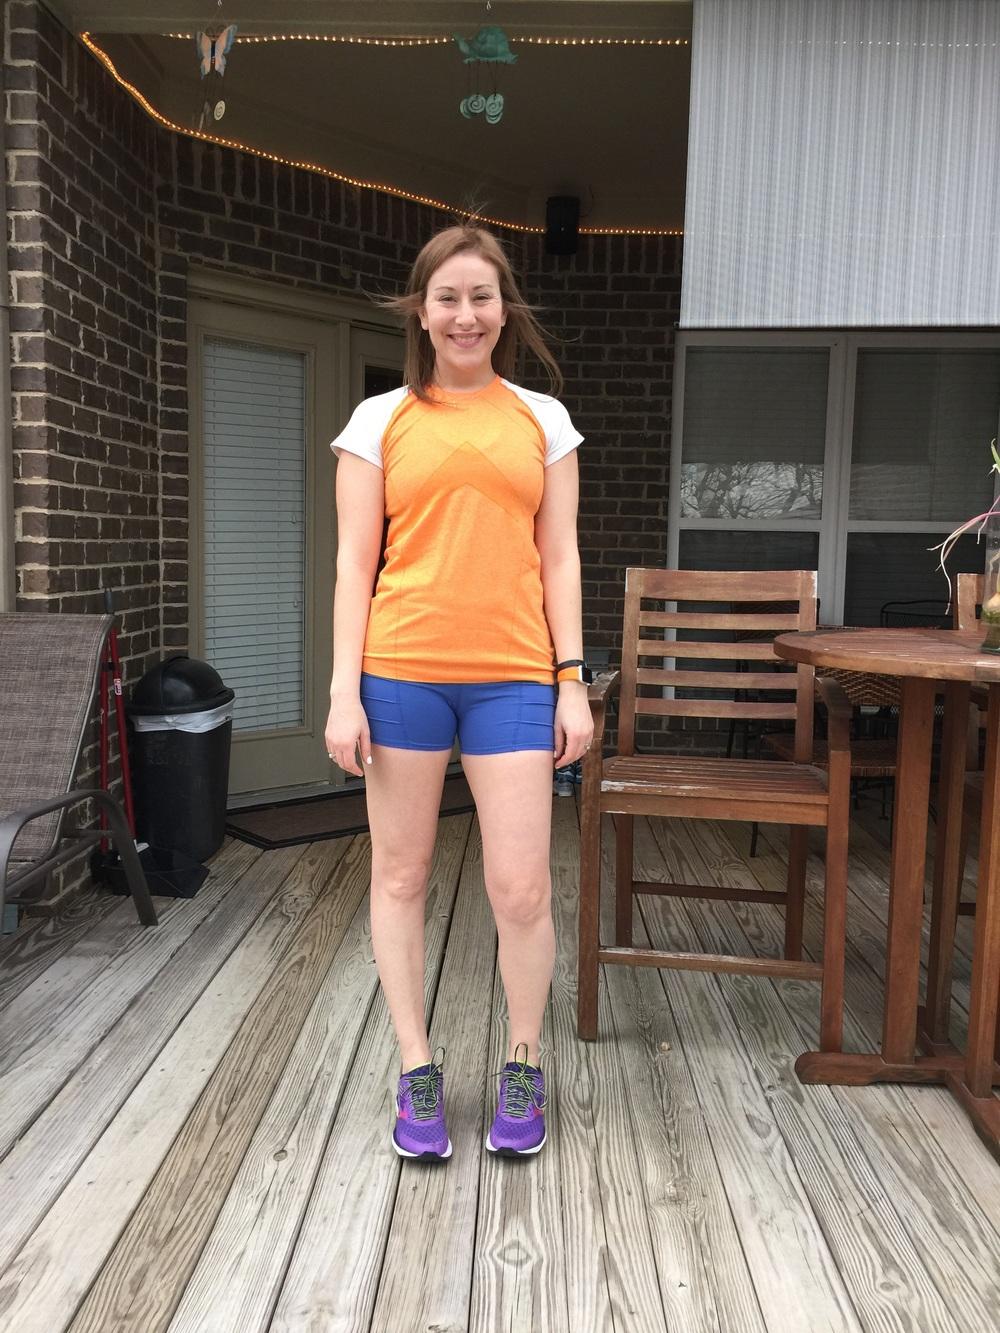 Girl pee tight shorts